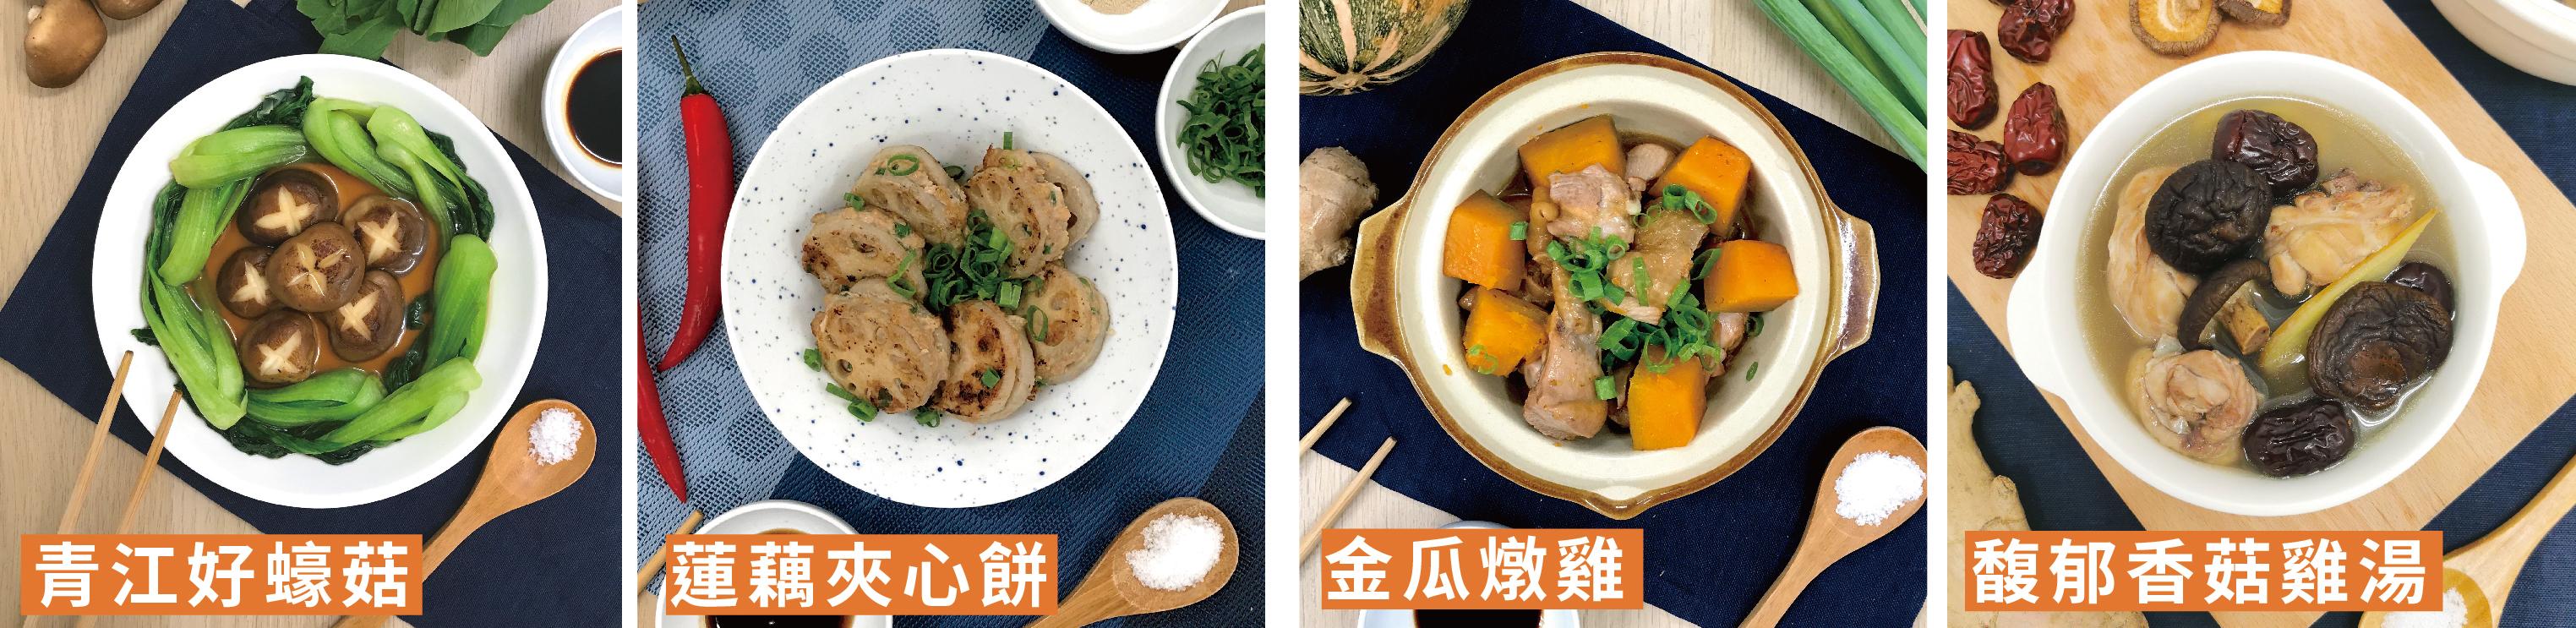 FreshRecipe享廚好食新鮮快煮方案2020年1月13日週次菜單